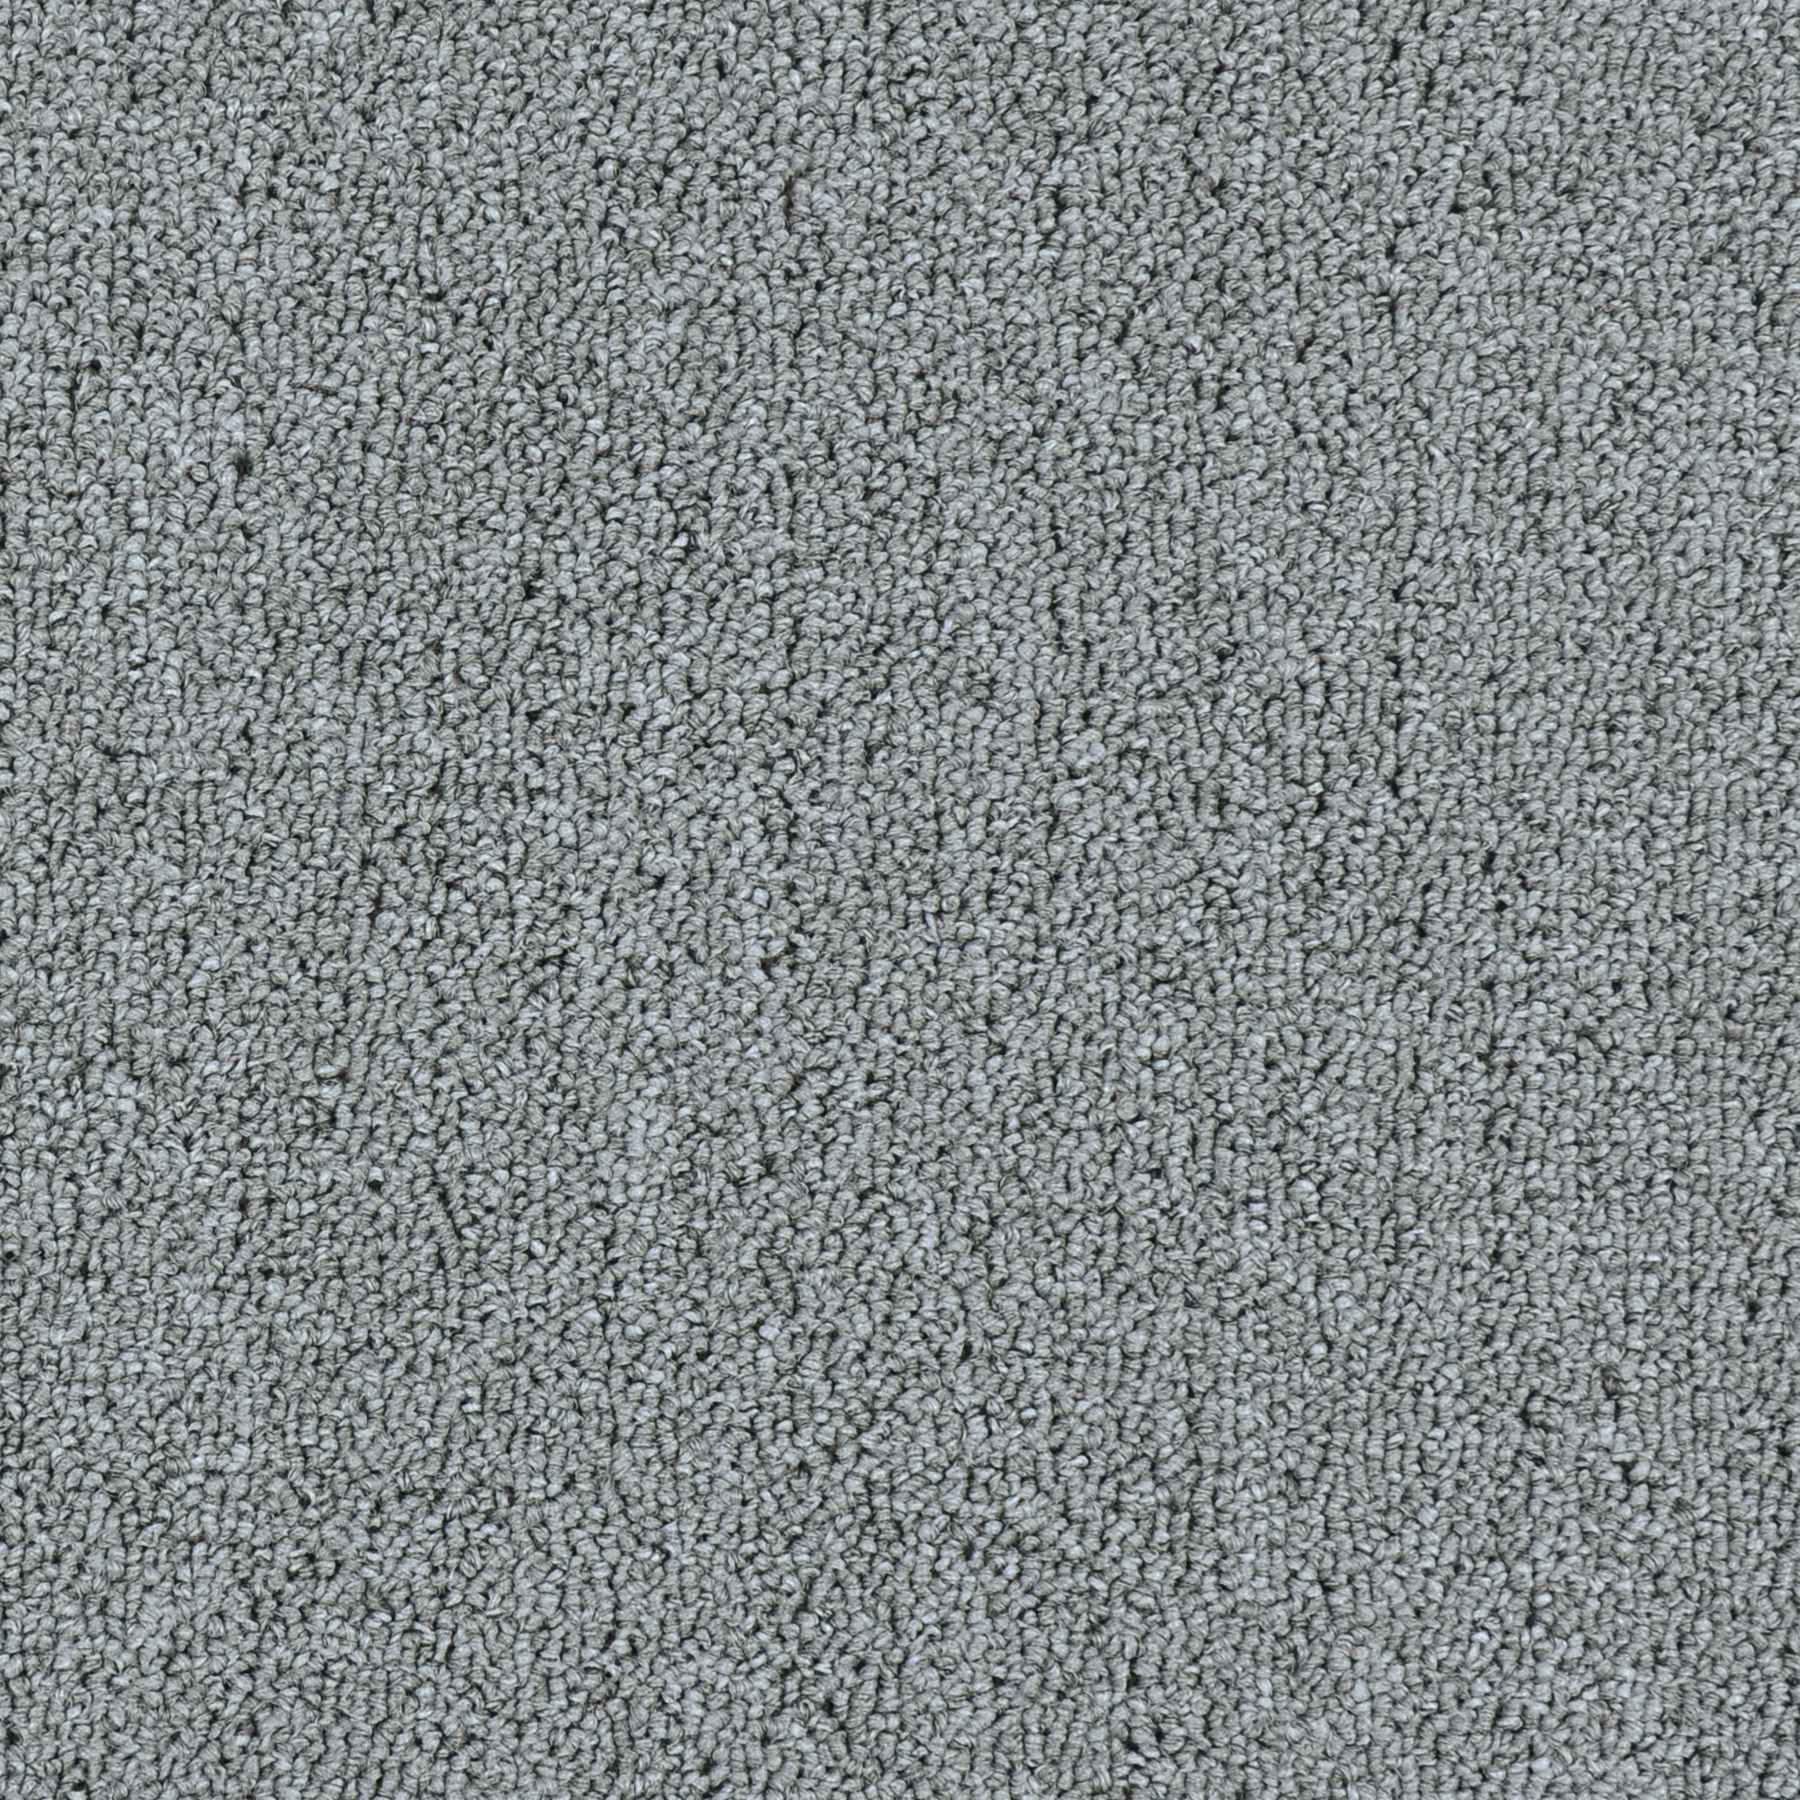 Light Grey — 3208